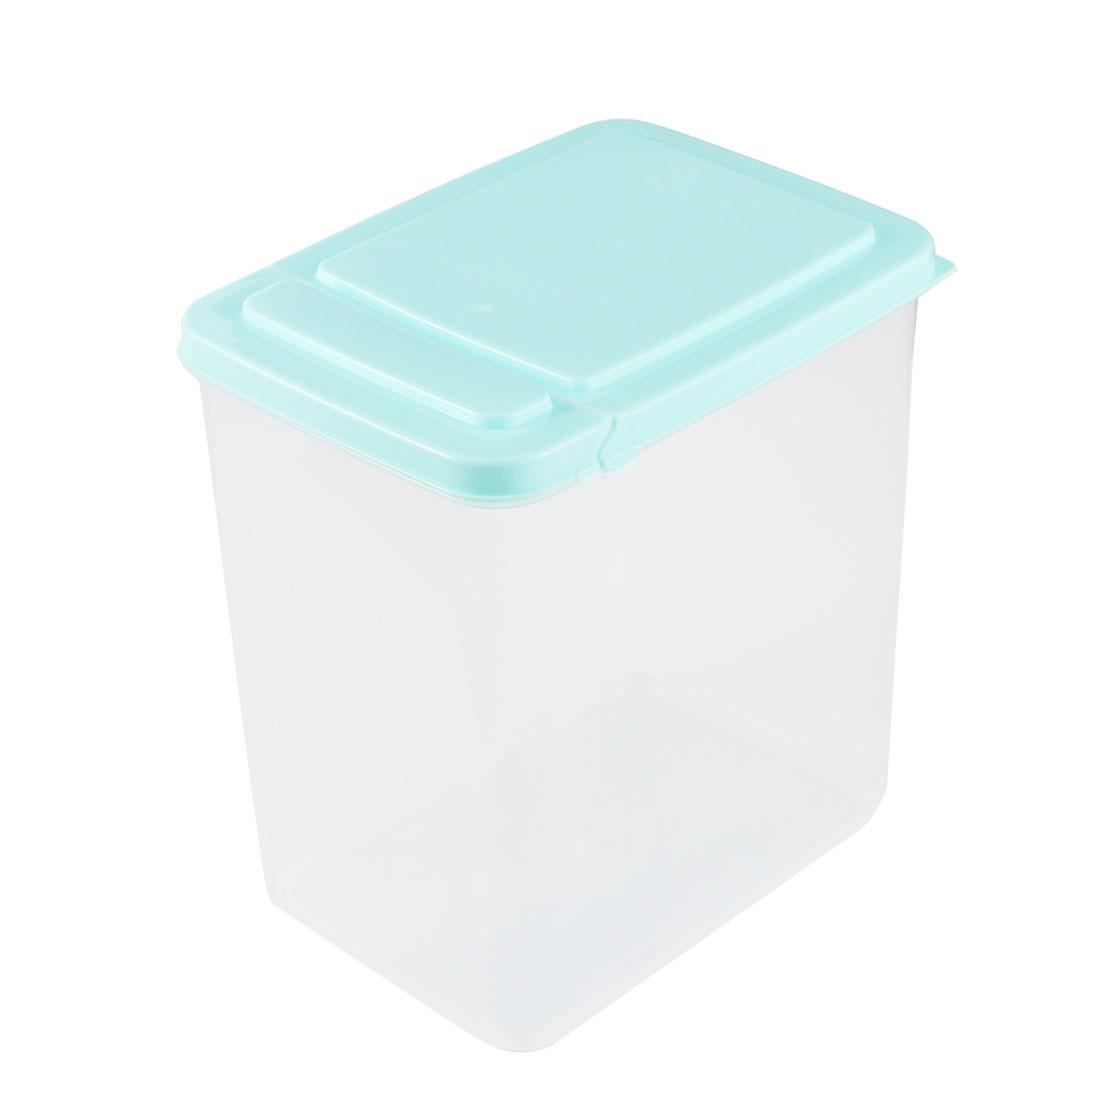 Office Plastic Food Storage Box Container 15cm x 11cm x 16cm 2L Blue